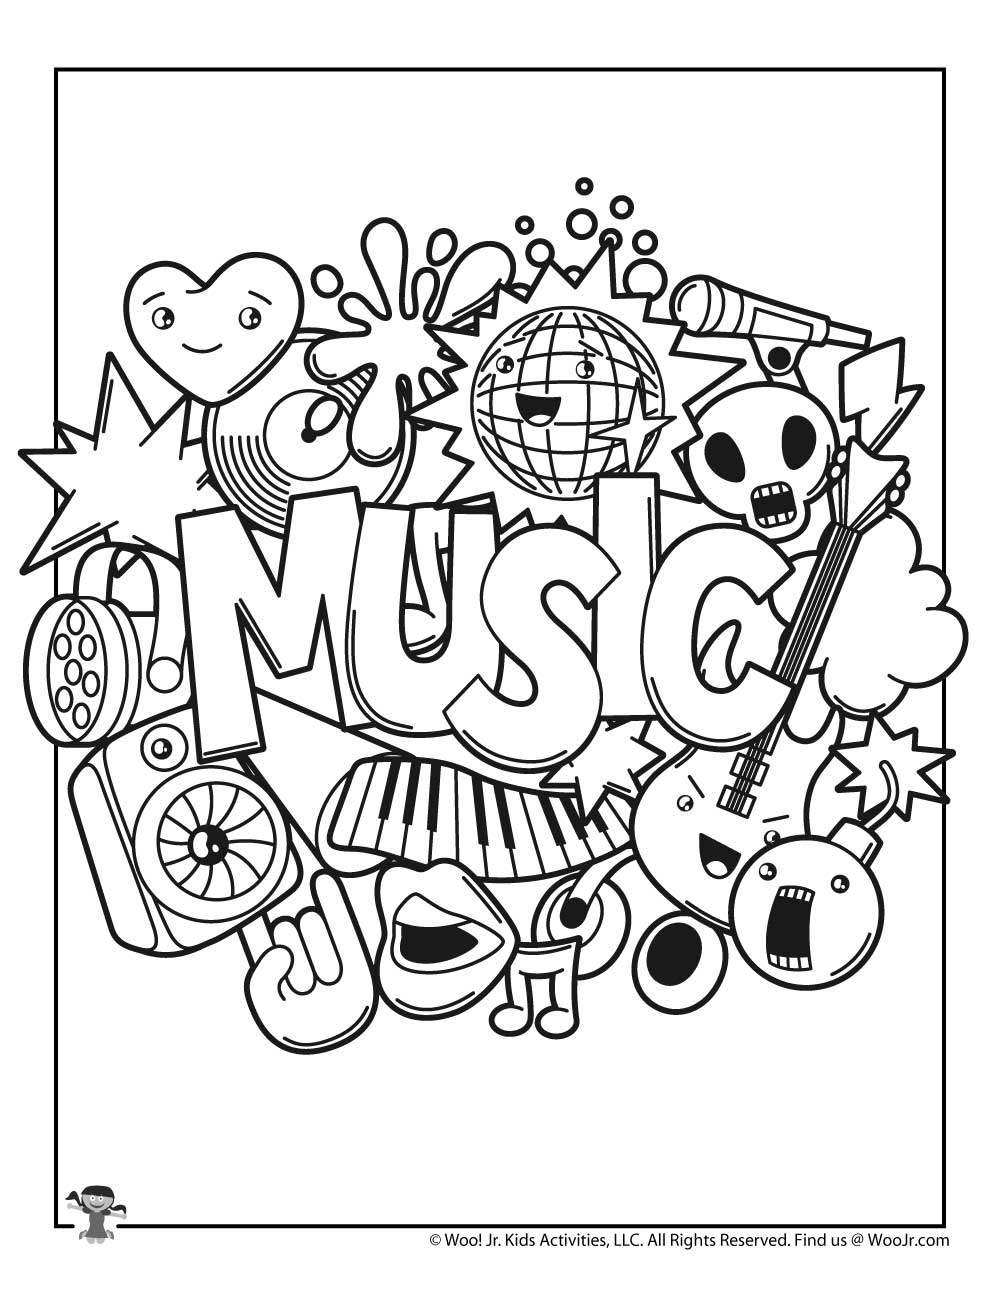 Kawaii Music Coloring Page  Woo! Jr. Kids Activities